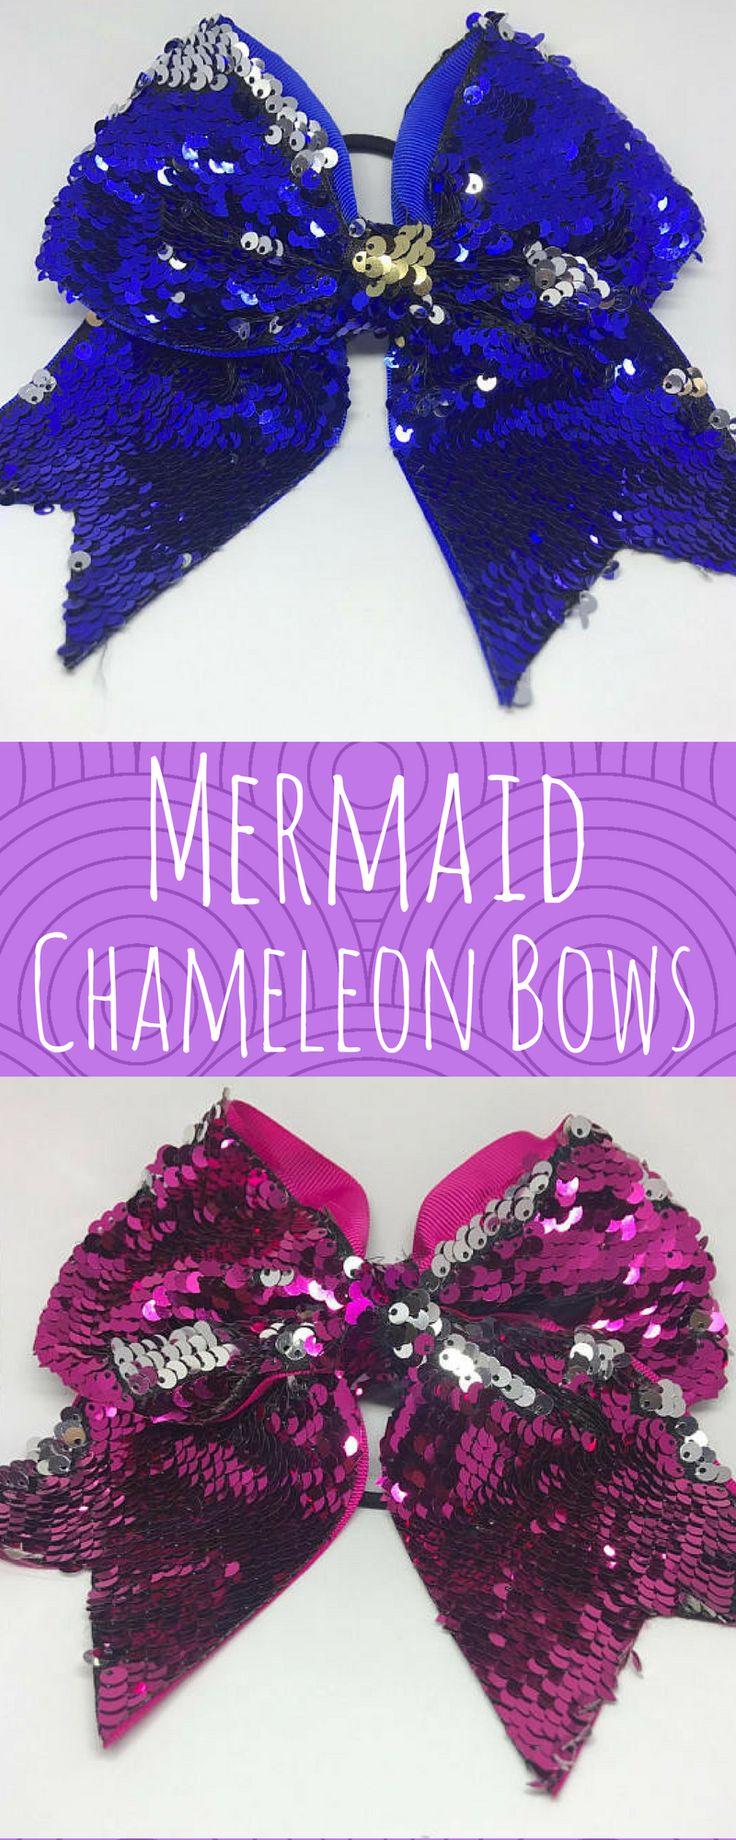 $8. Mermaid Chameleon Two Tone Sequin Cheer Bows Reversible Sequin Cheer Bows Two Tone 2 Tone Team Bows Holiday Bows. Cheerleading accessories, fun cheerleader gift! #cheerleading #ad